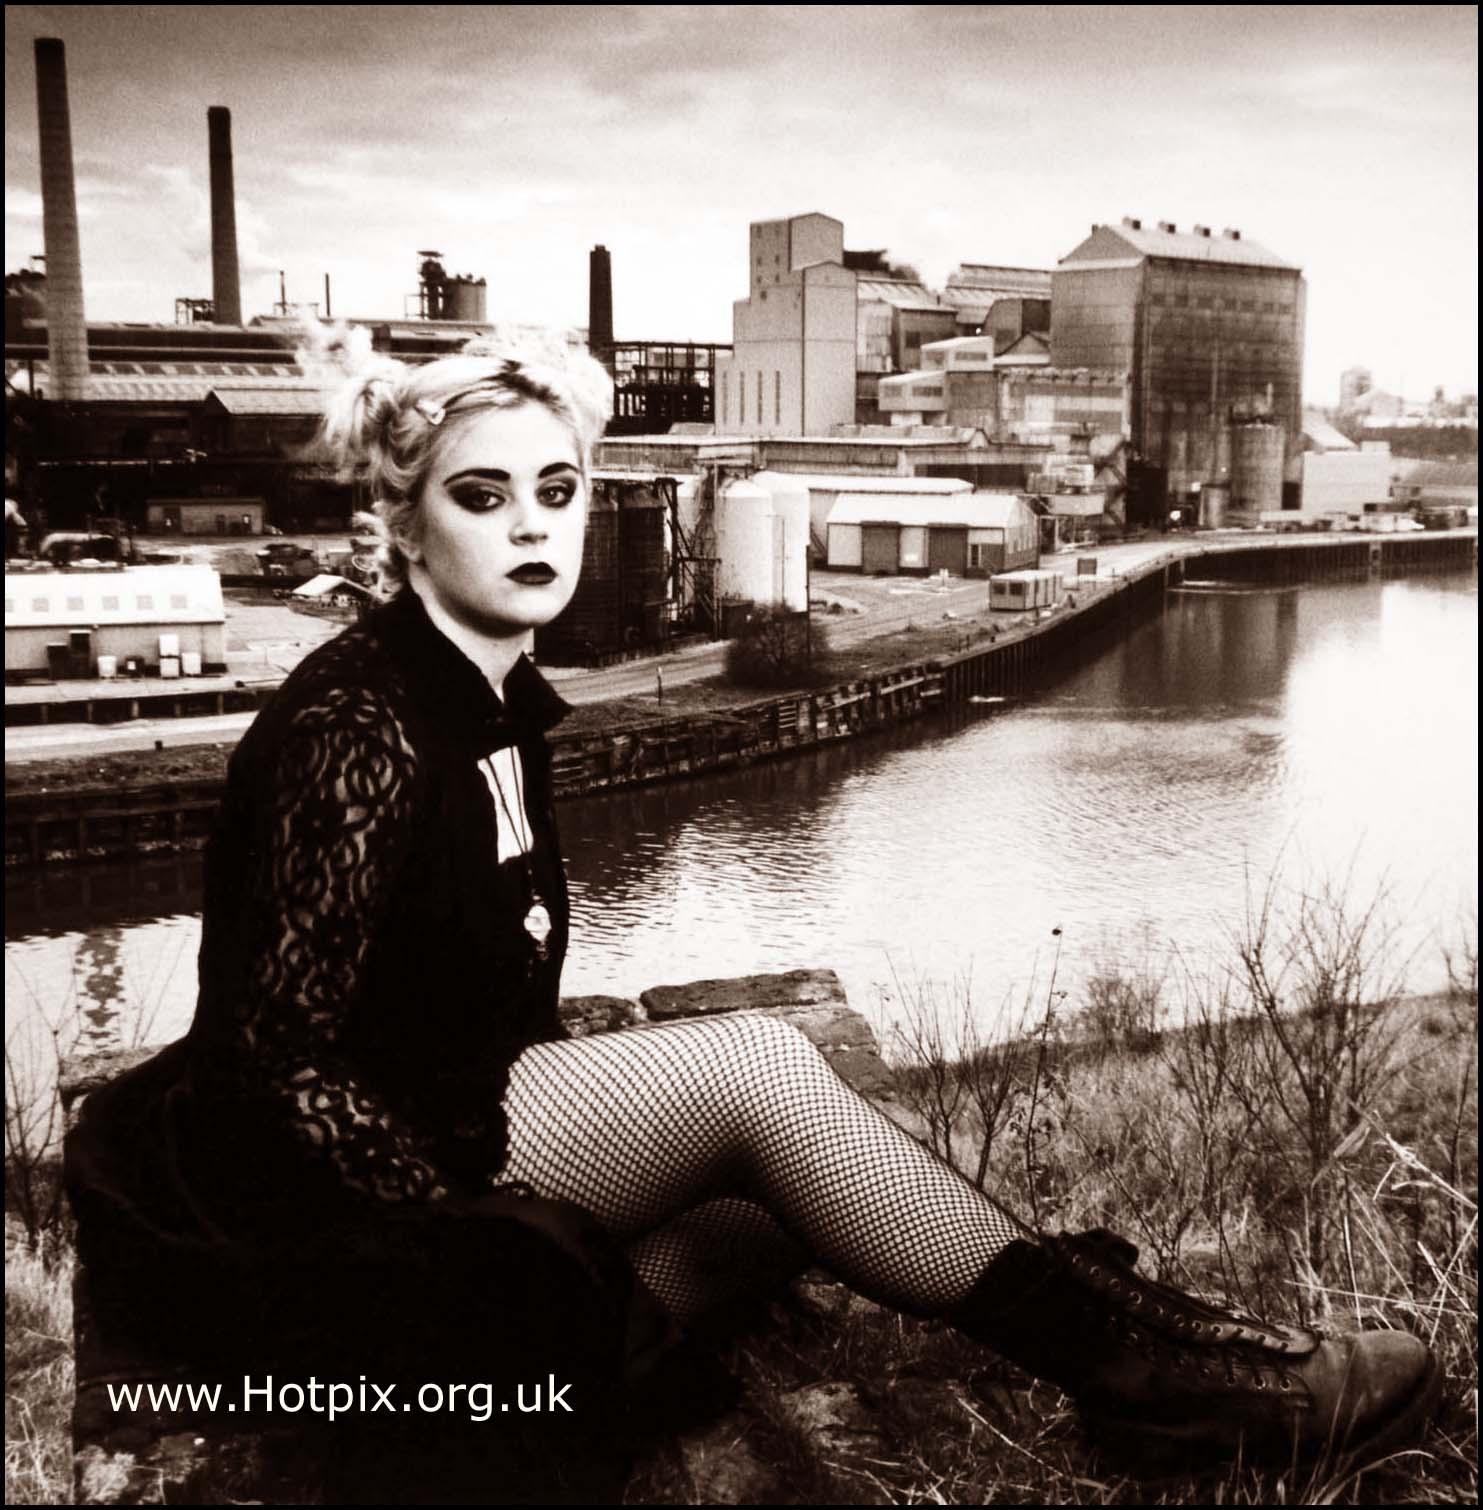 goth,northwich,cheshire,england,UK,gothic,portrait,girl,woman,lady,fishnet,fishnets,lace,lacy,gothess,punkette,punk,factory,salt,village,michelle,manion,mannion,weaverham,river,weaver,chemical,plant,ici,anderton,britain,canal,saline,process,processing,B/W,black,white,mono,monochrome,sex,sexy,porn,porno,girlie,erotic,pretty,fetish,fetishist,cool,person,people,image,gothy,gothing,babes,female,tonysmith,tony,smith,HOT PIX,hotpicks,muchacha,femenina,de,la,mujer,se\u00f1ora,\u5973\u6027\u30e1\u30b9\u306e\u5973\u6027\u306e\u5973\u306e\u5b50,\u592b\u4eba\u5973\u6027\u5987\u5973\u5973\u5b69,racy,@hotpixuk